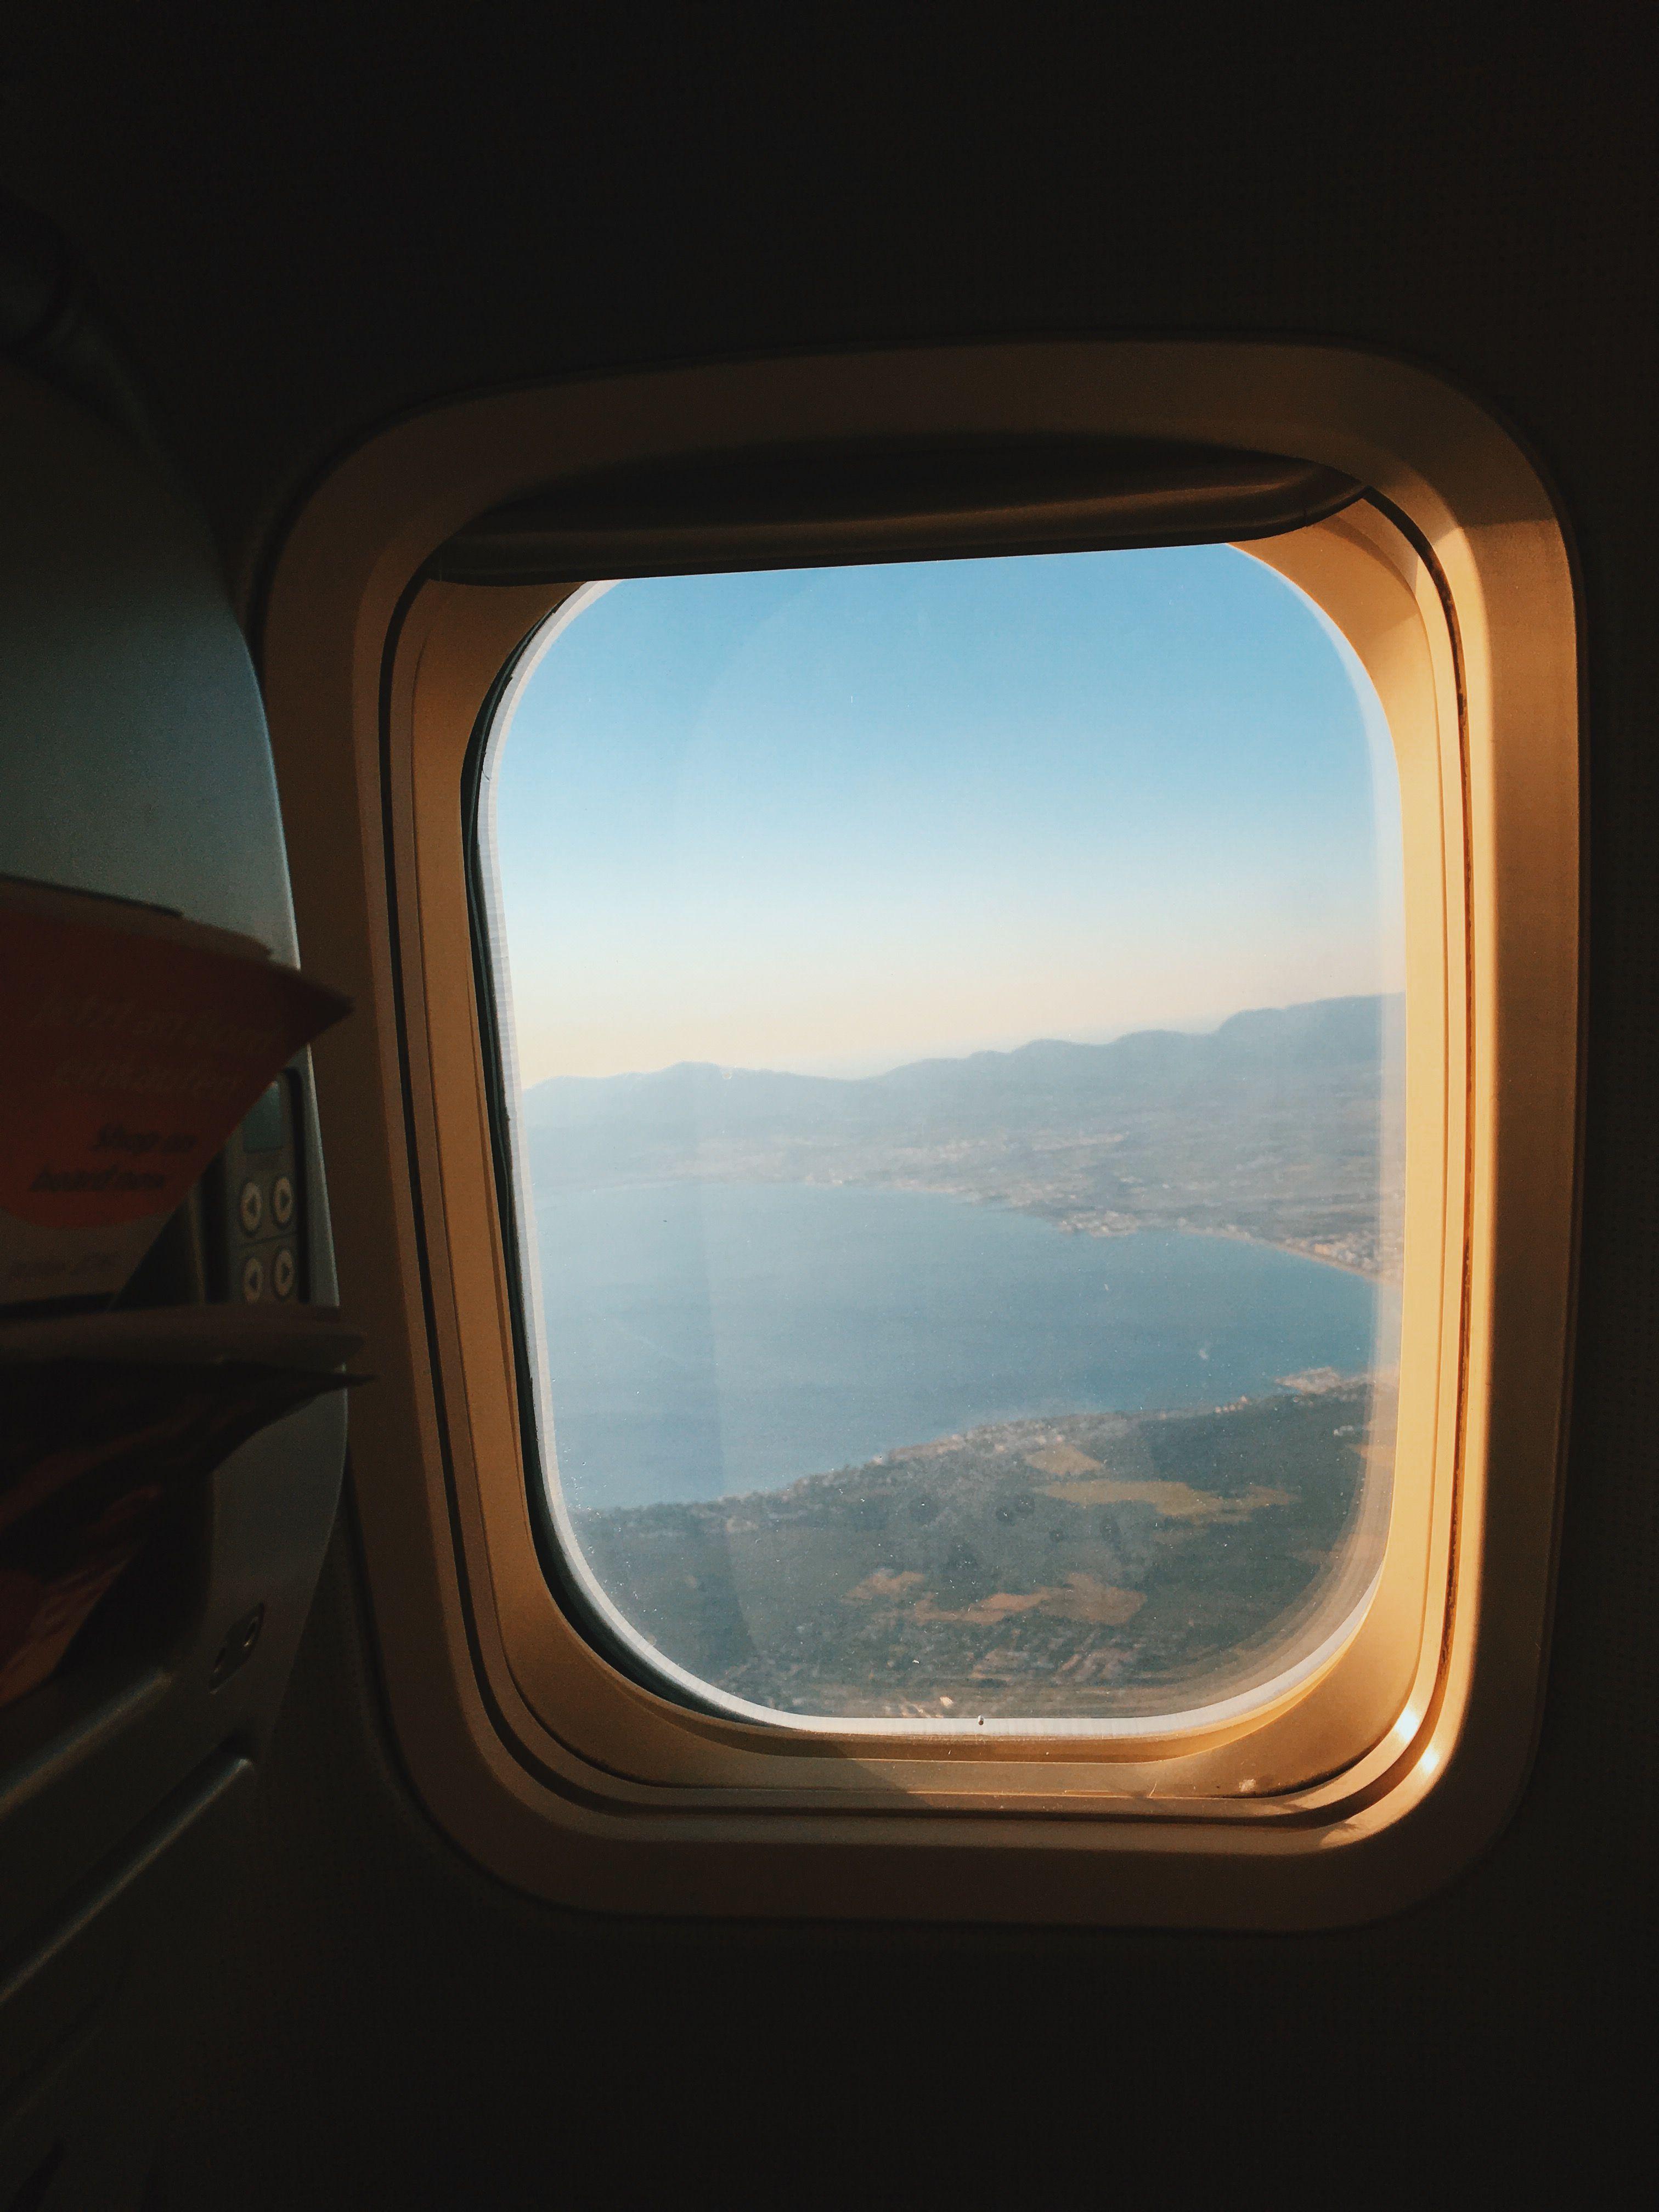 Airplane Window Seat Airplane Window Travel Light Packing